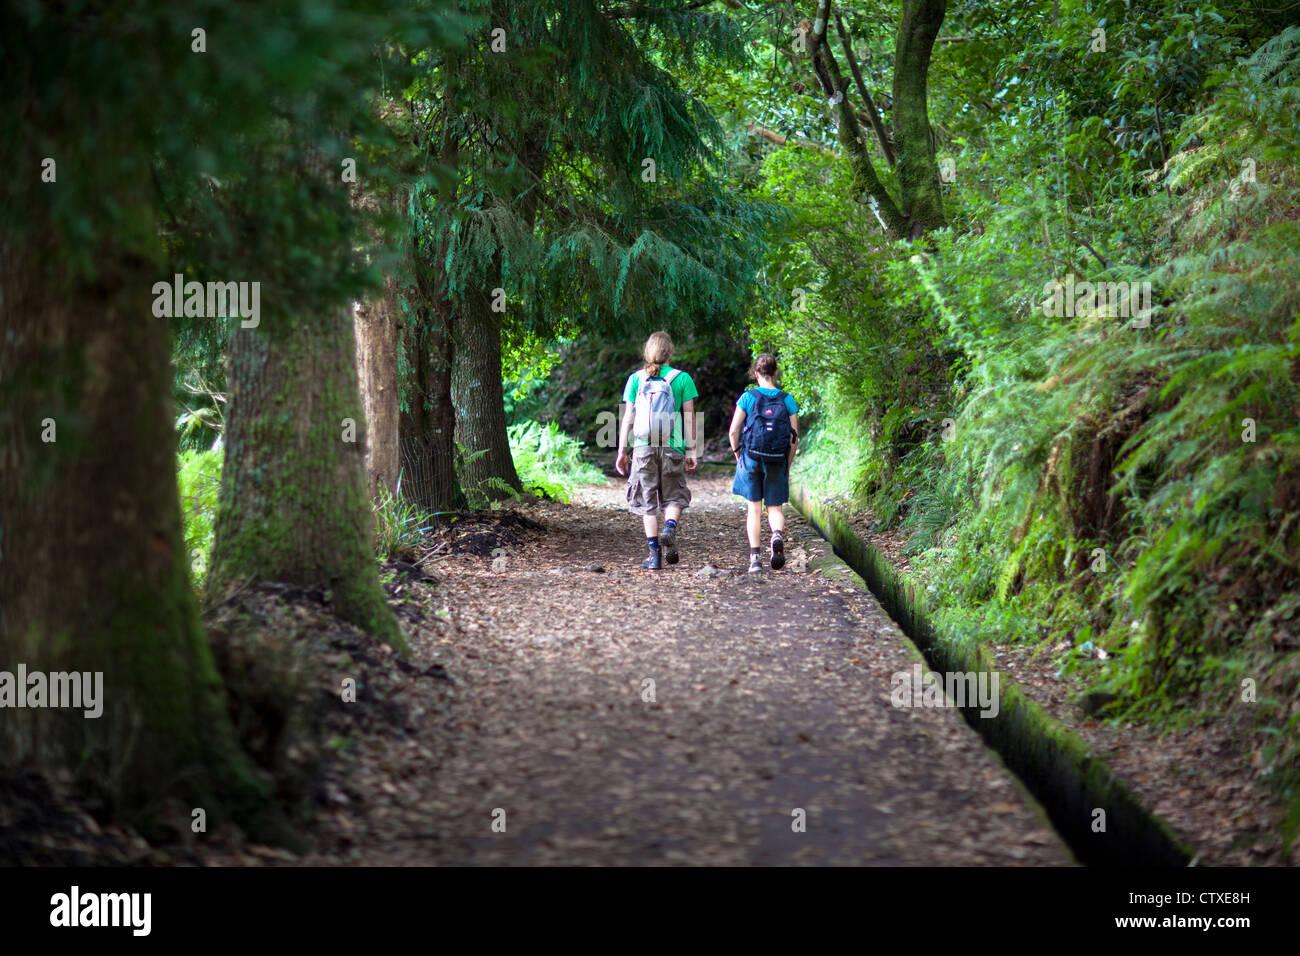 Forêt à pied Madère Portugal Photo Stock